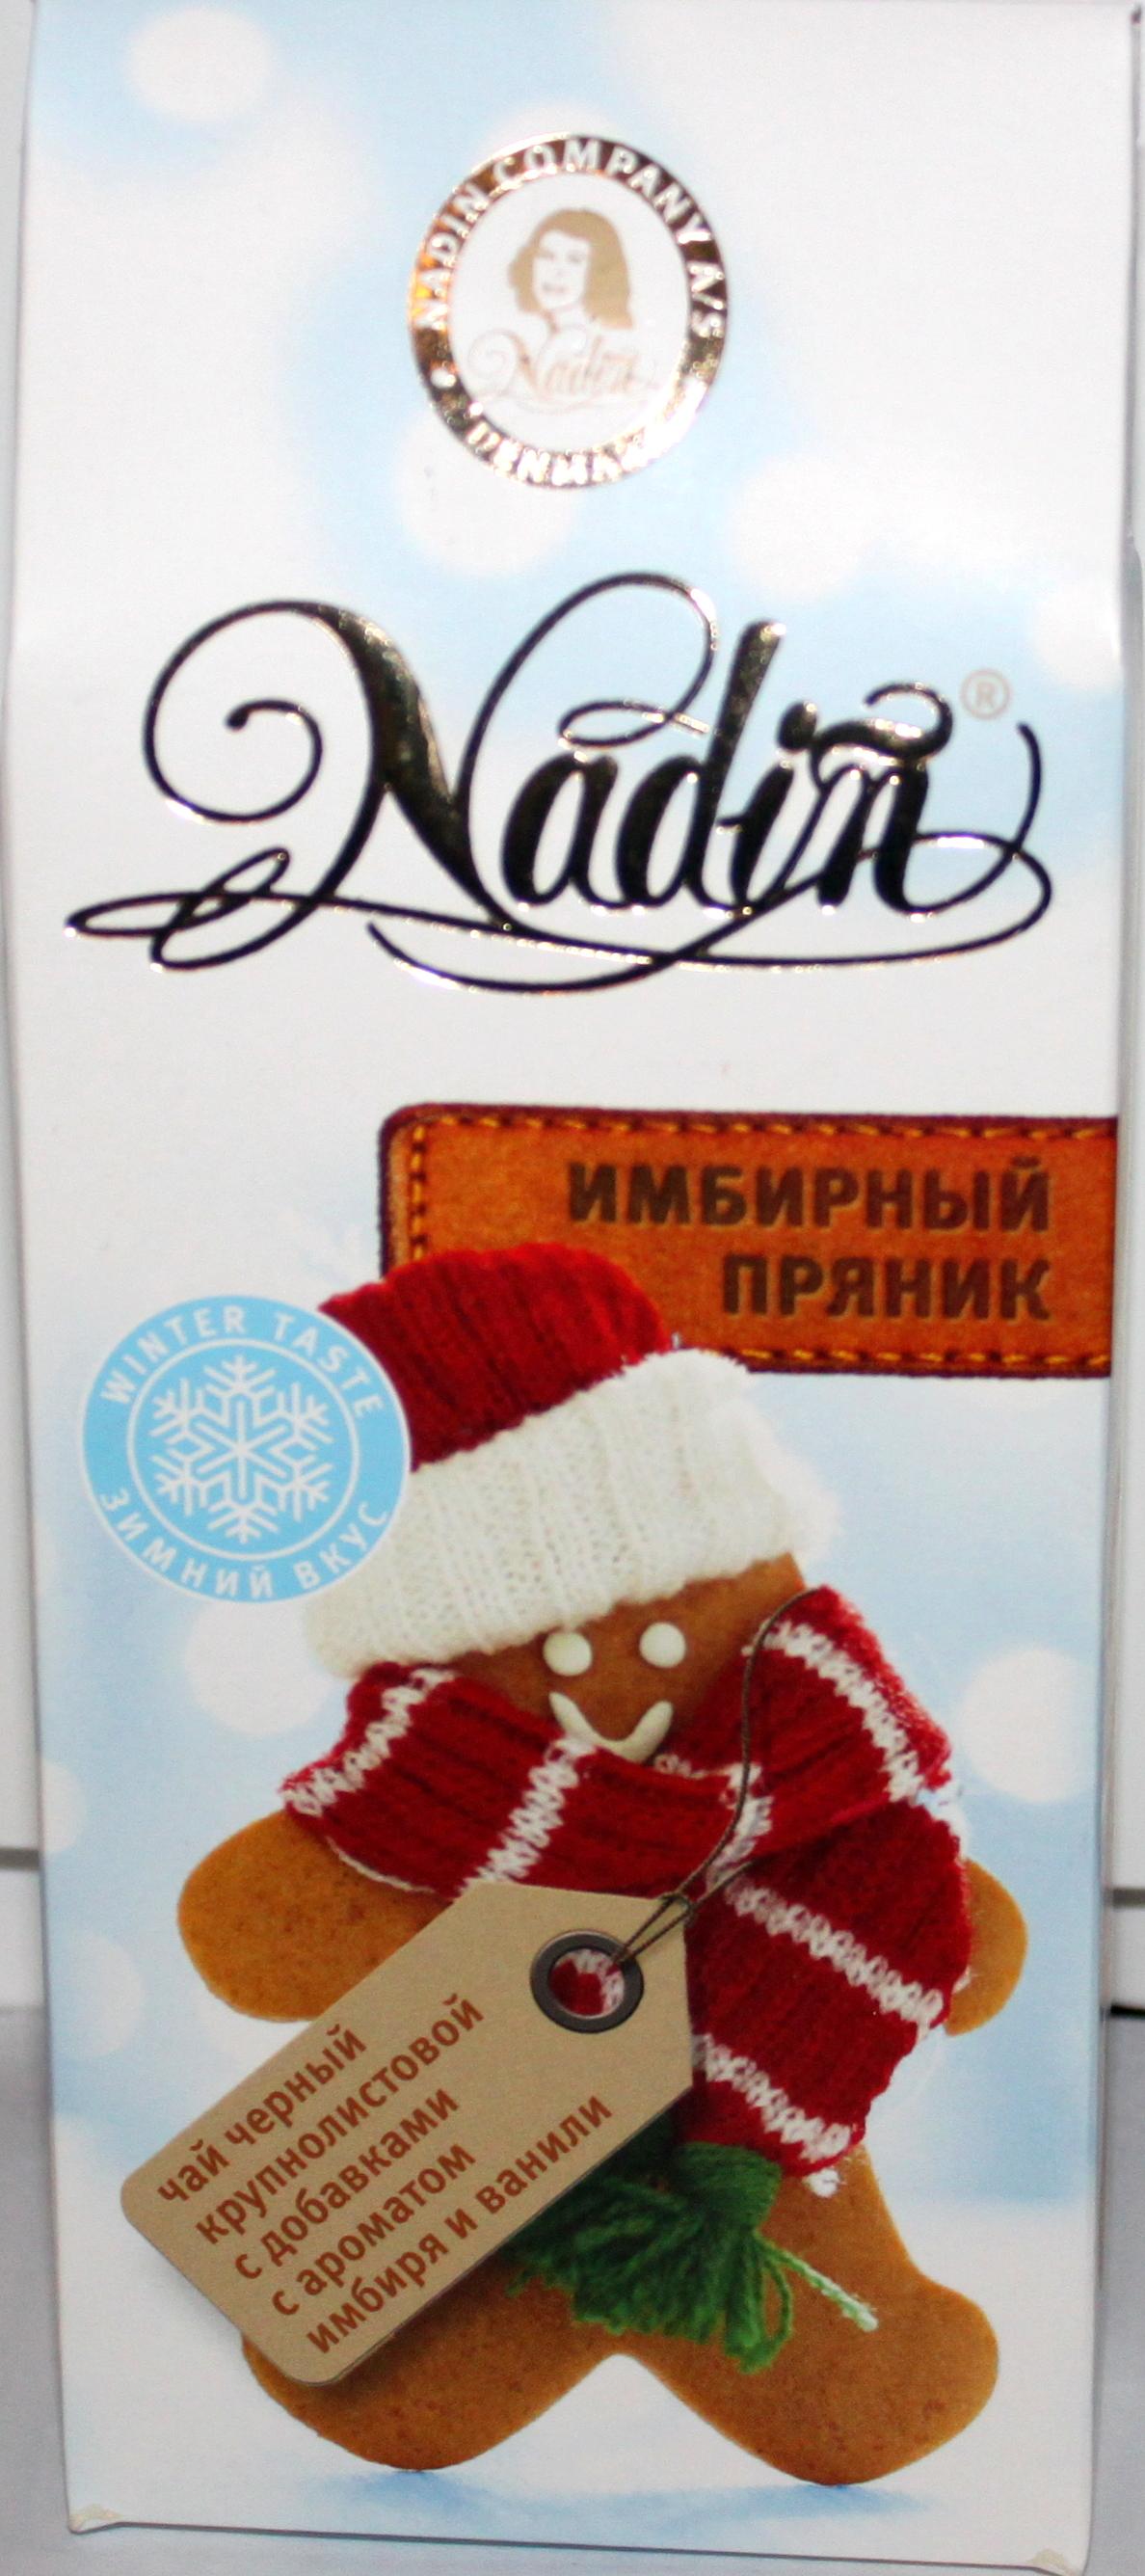 Чай Надин Имбирный пряник